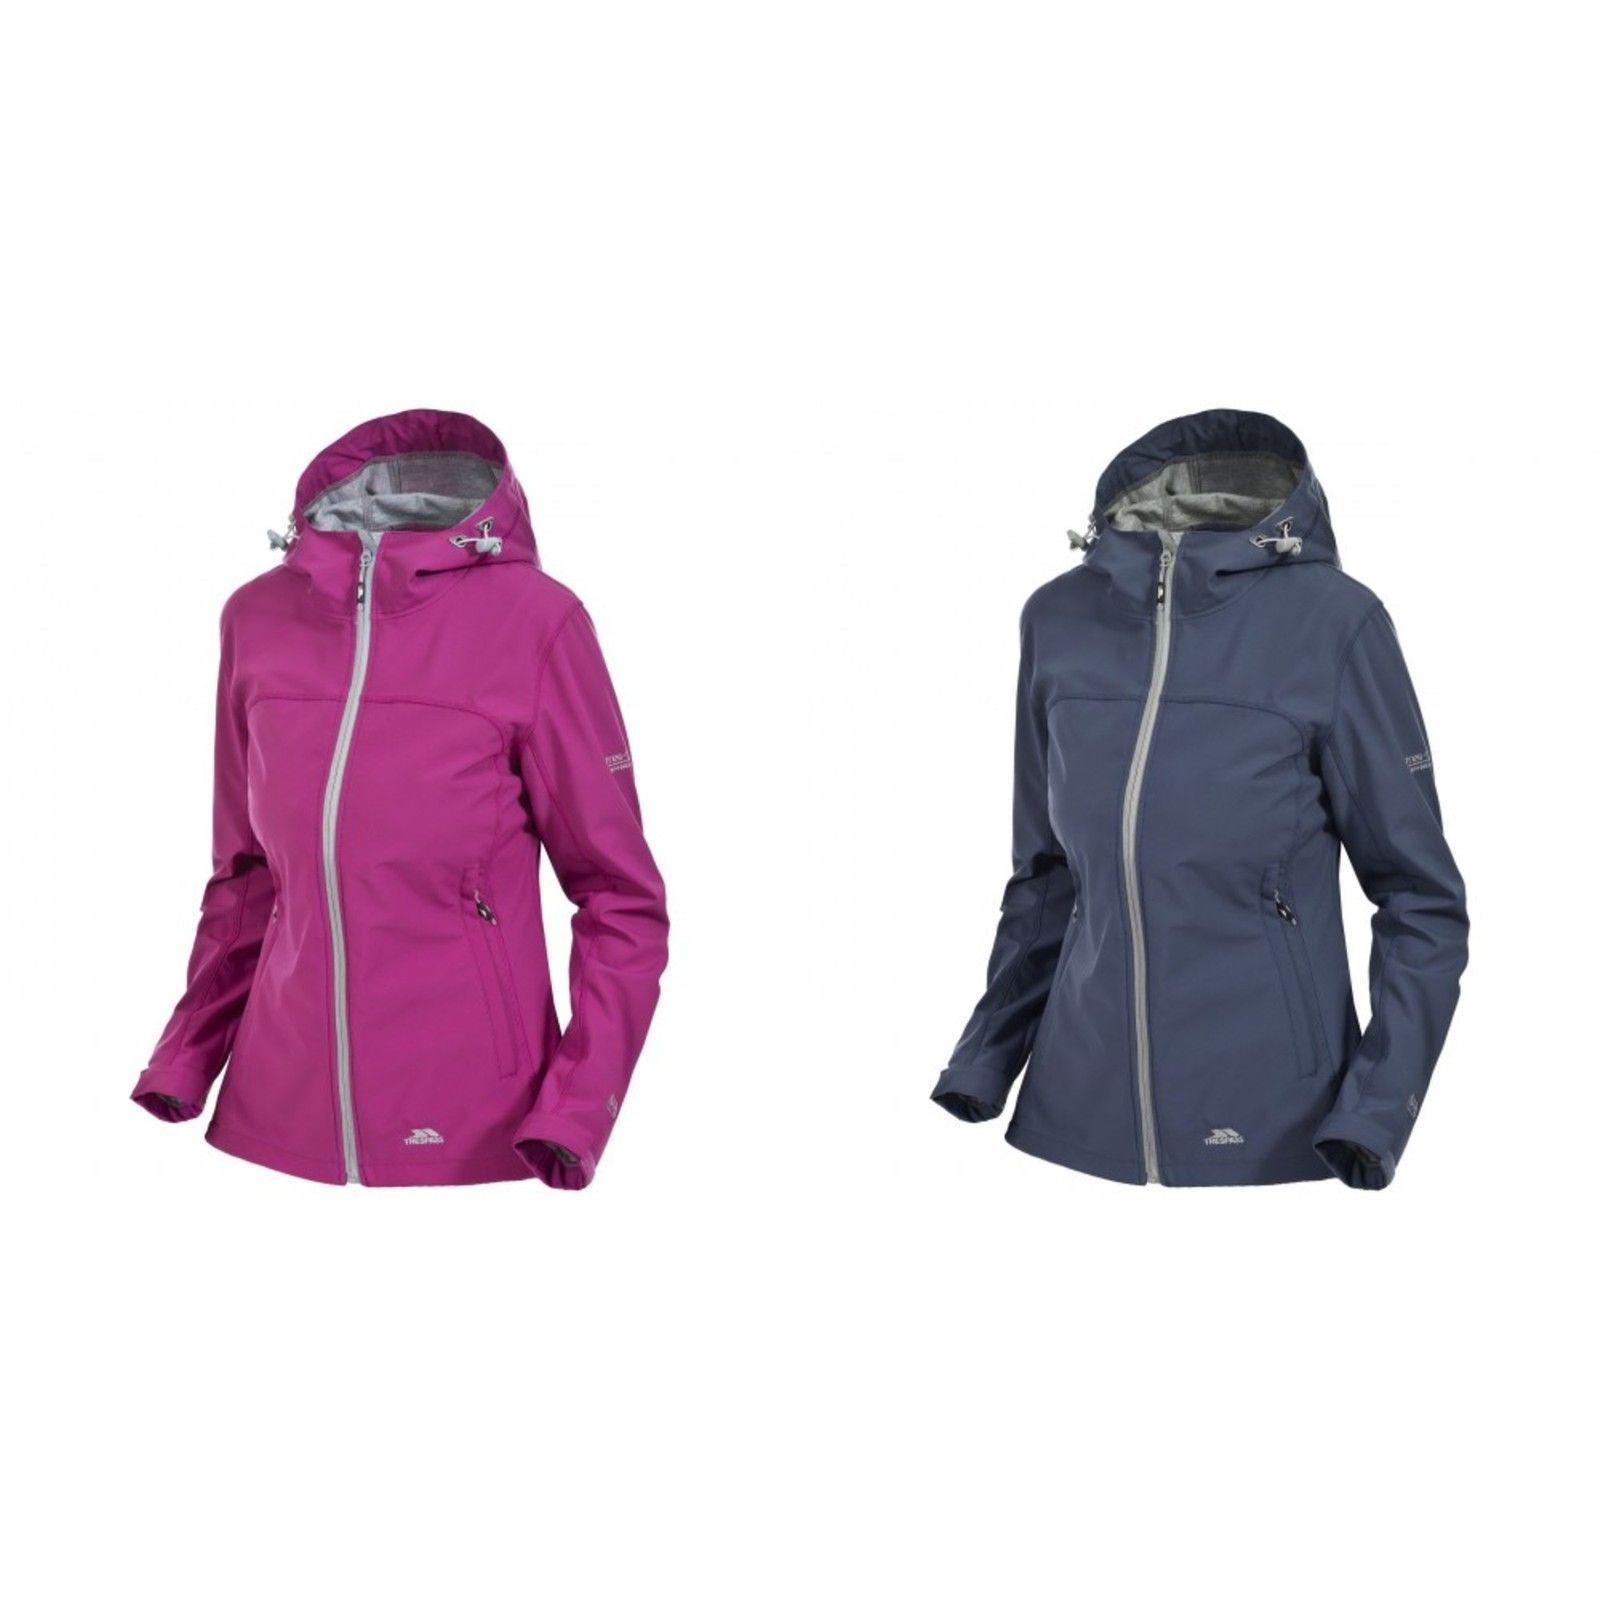 7ec3c9c20b5 Trespass Womens Ladies Loris Waterproof Softshell Jacket